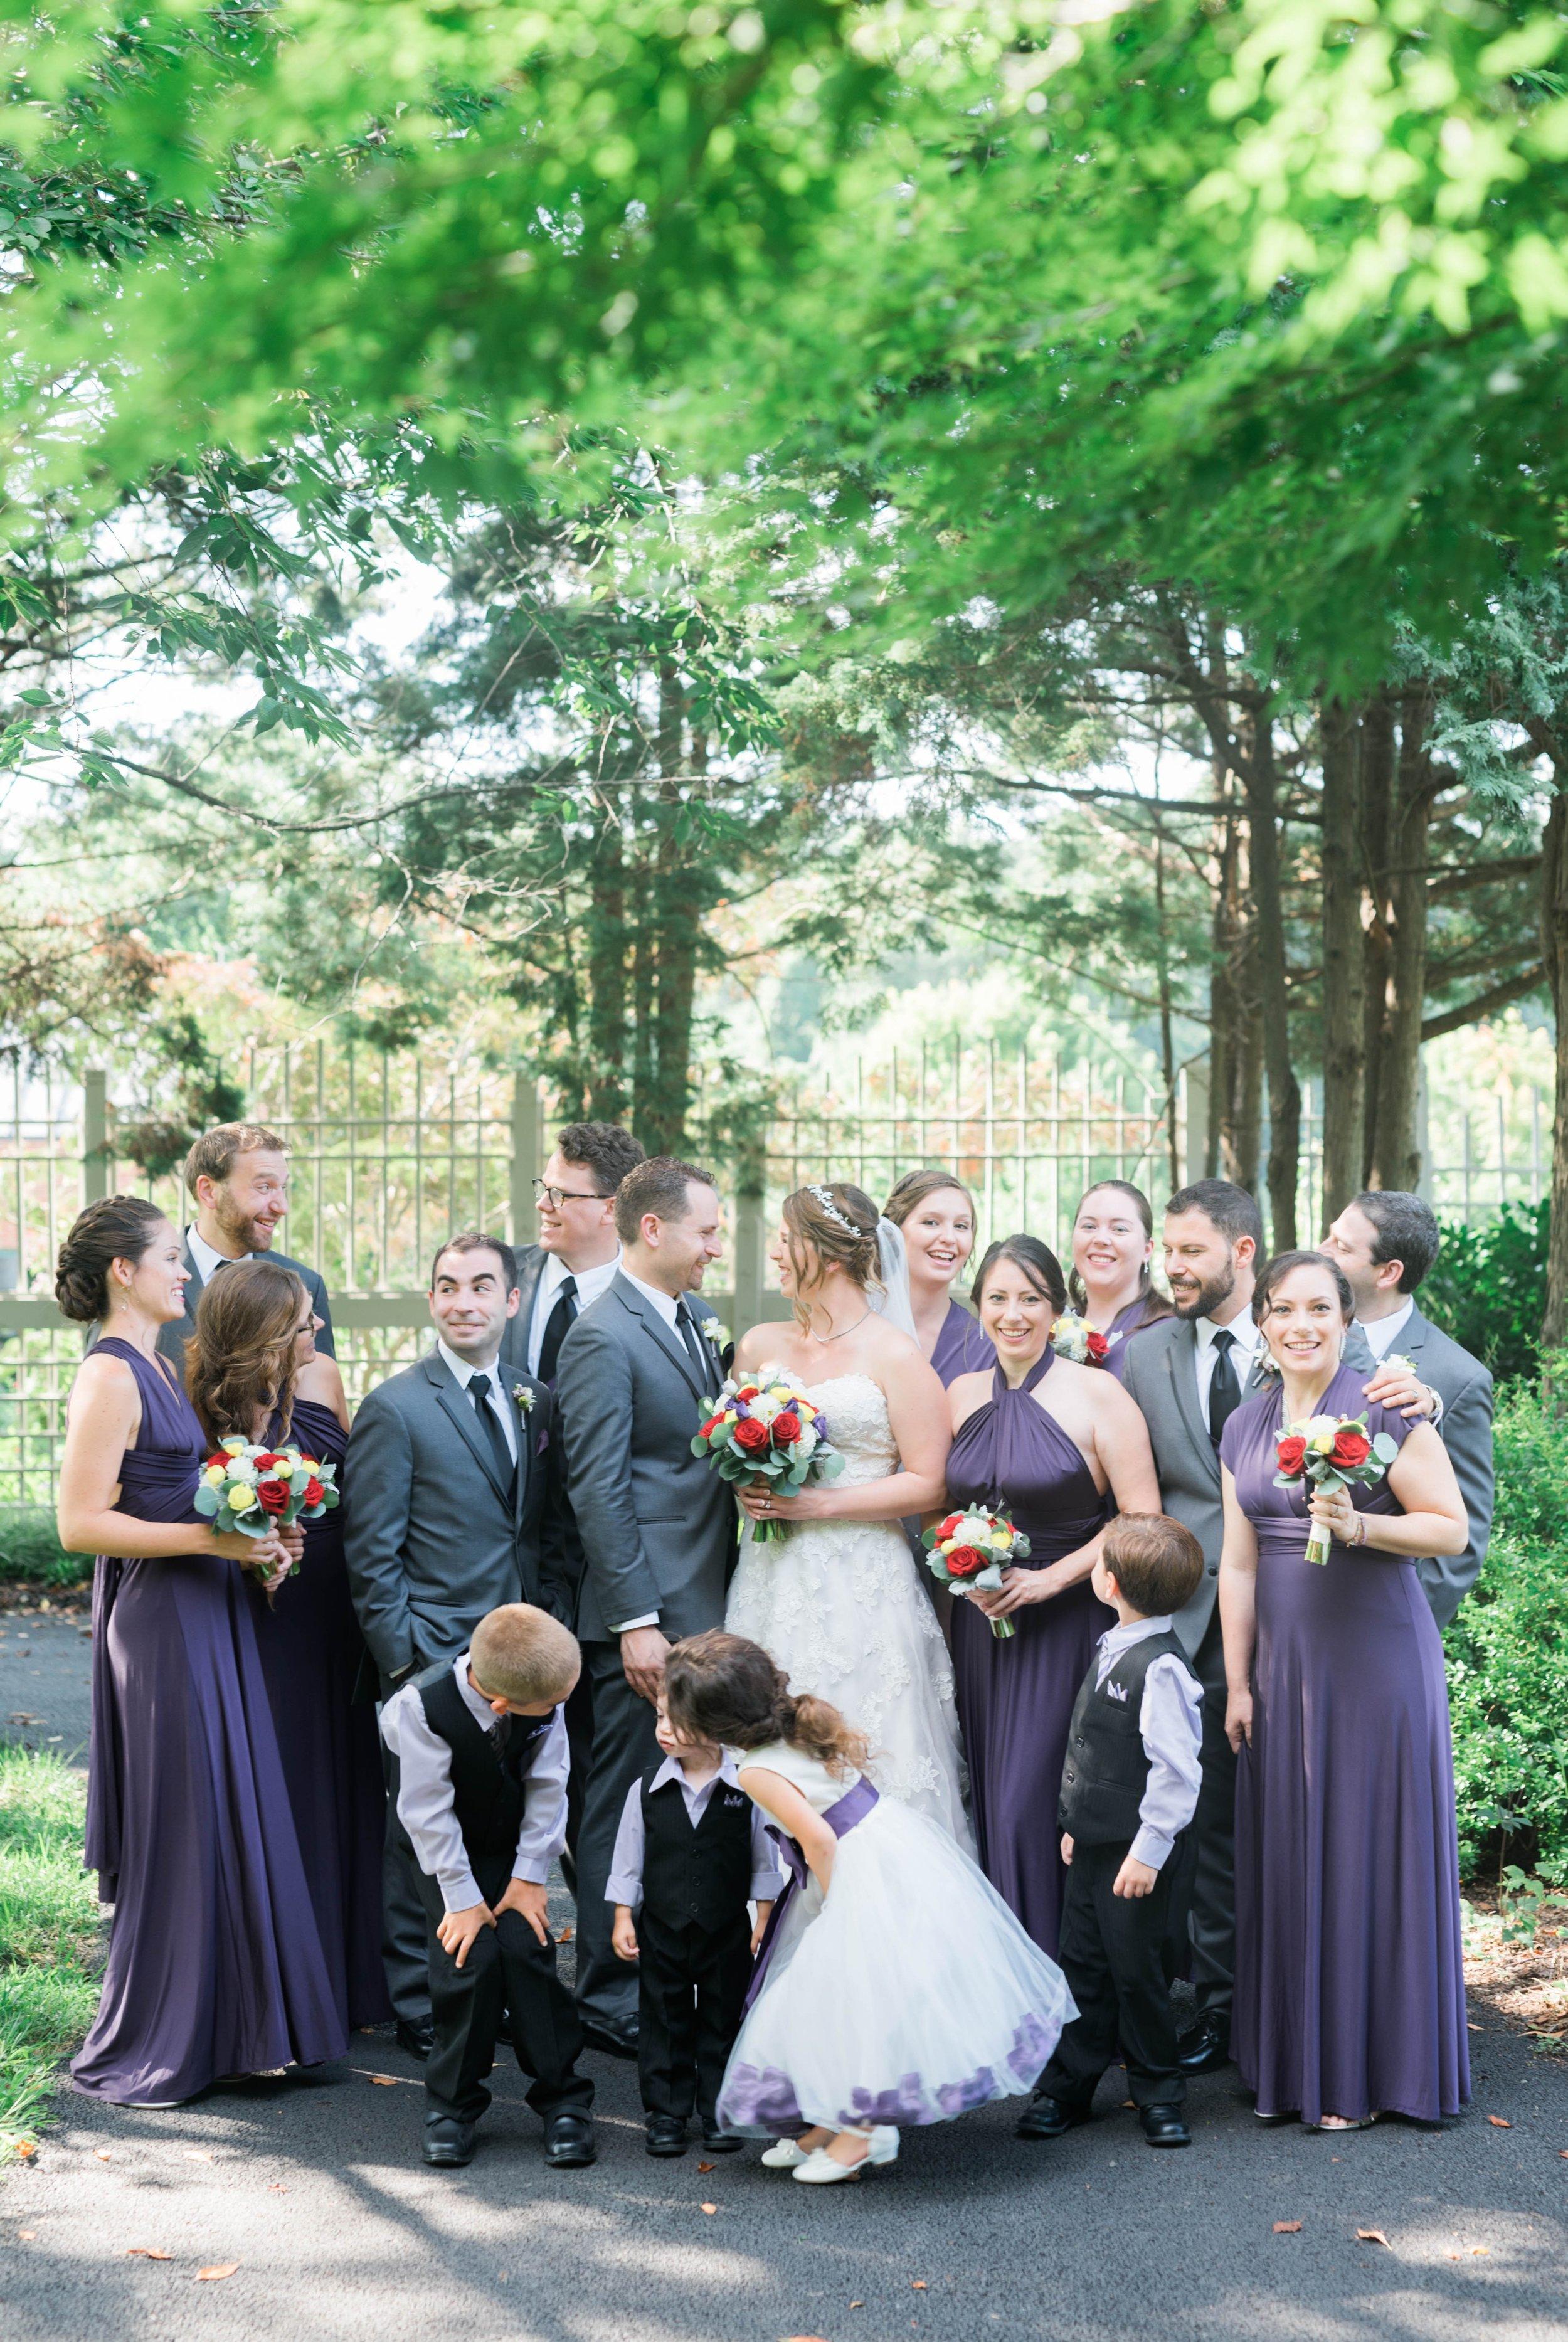 TheAtriumatMeadowlark_Virginiawedding photographer_lynchburgweddingphotographer_DCweddingPhotographer_KristinAaron 3.jpg